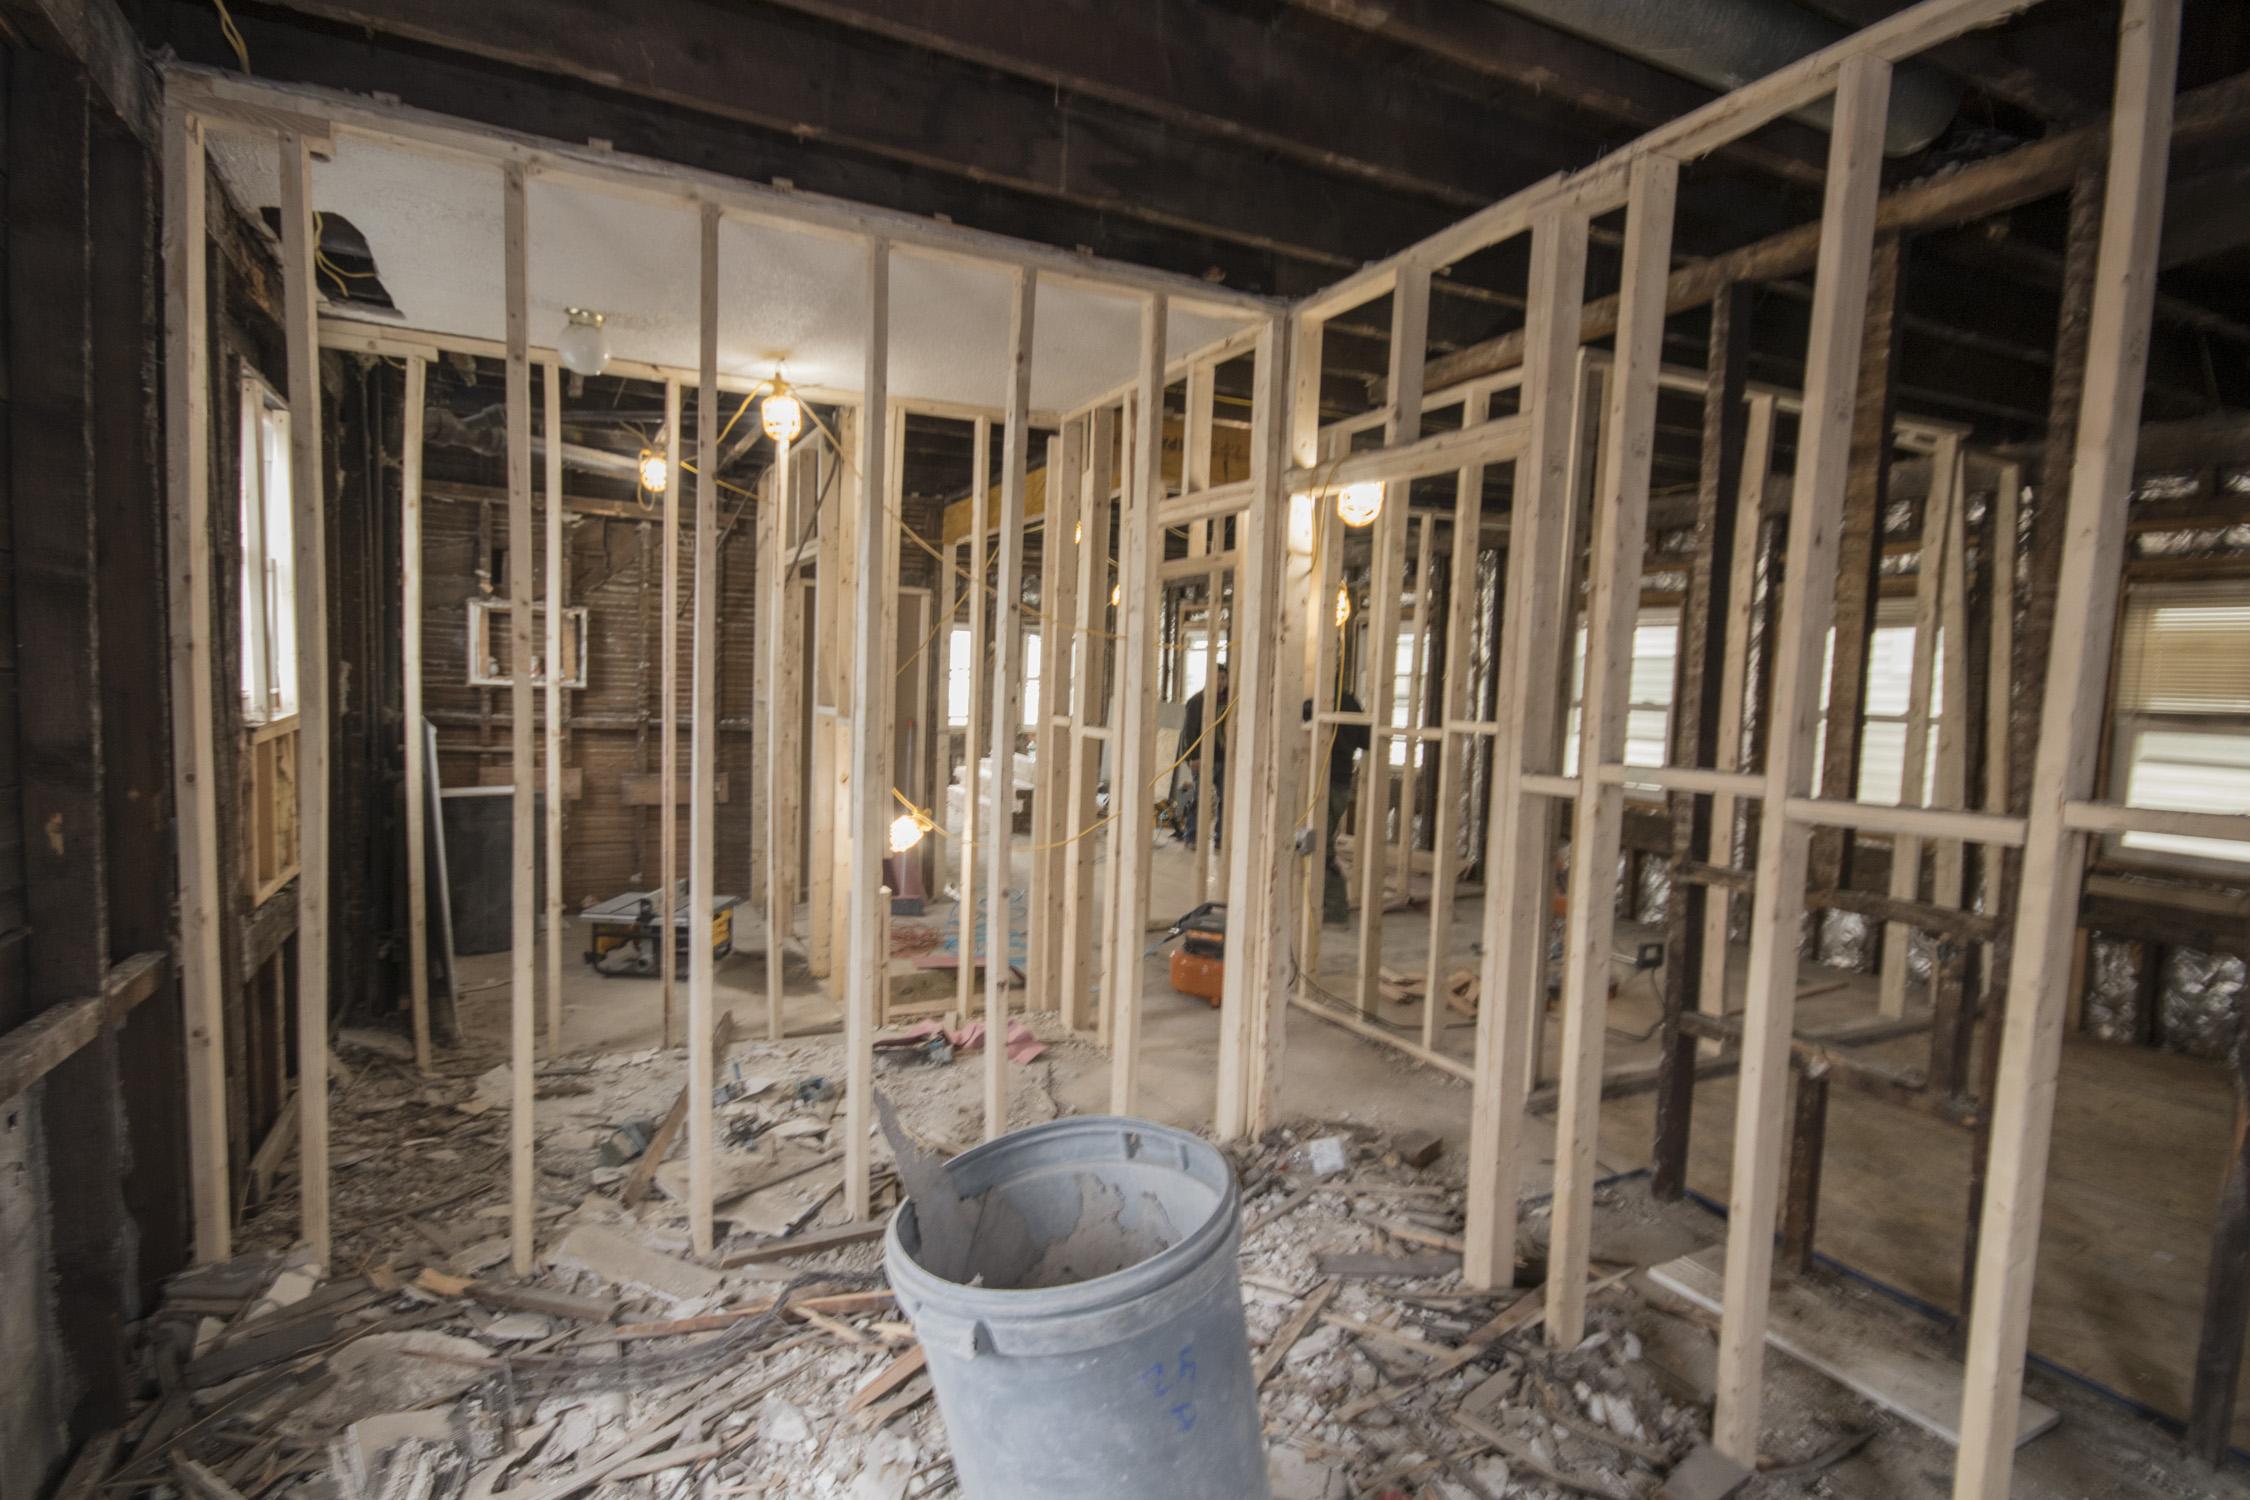 25 Darling St Boston General Contractors P Northeast Contractors_47